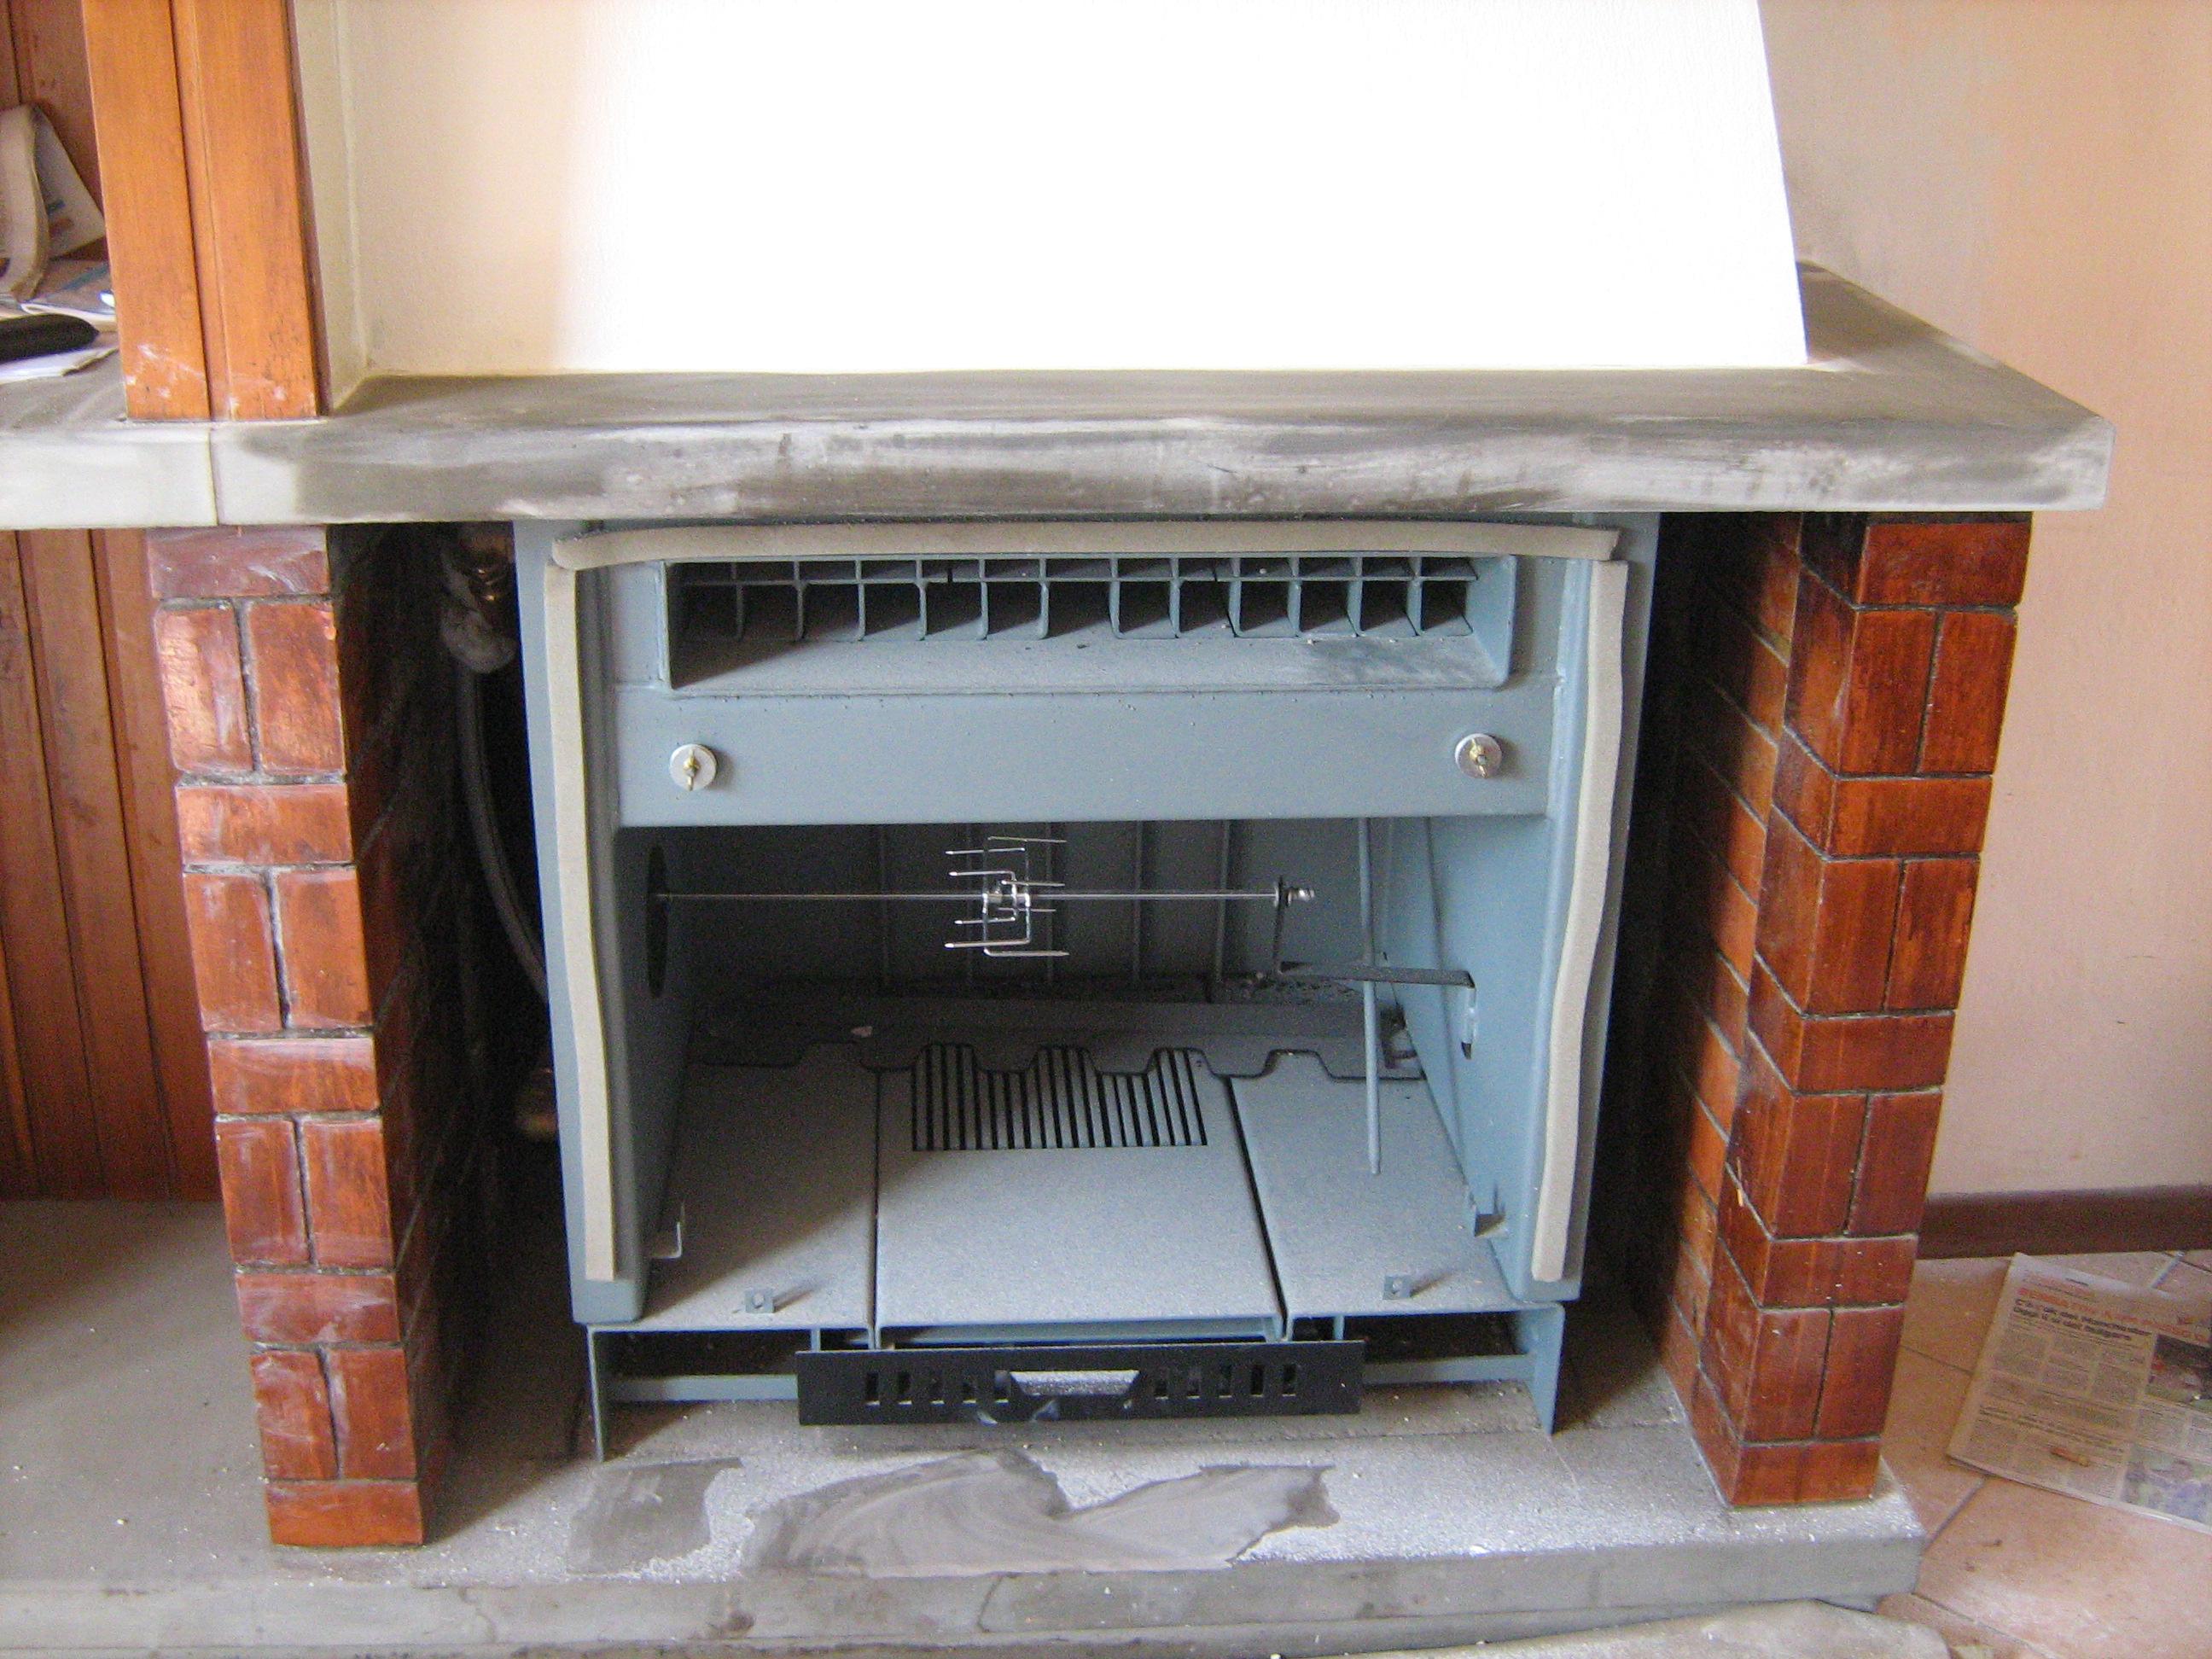 Caminetti stufe a pellet e legna edilkamin termocamini html autos weblog - Edilkamin termostufe a pellet prezzi ...